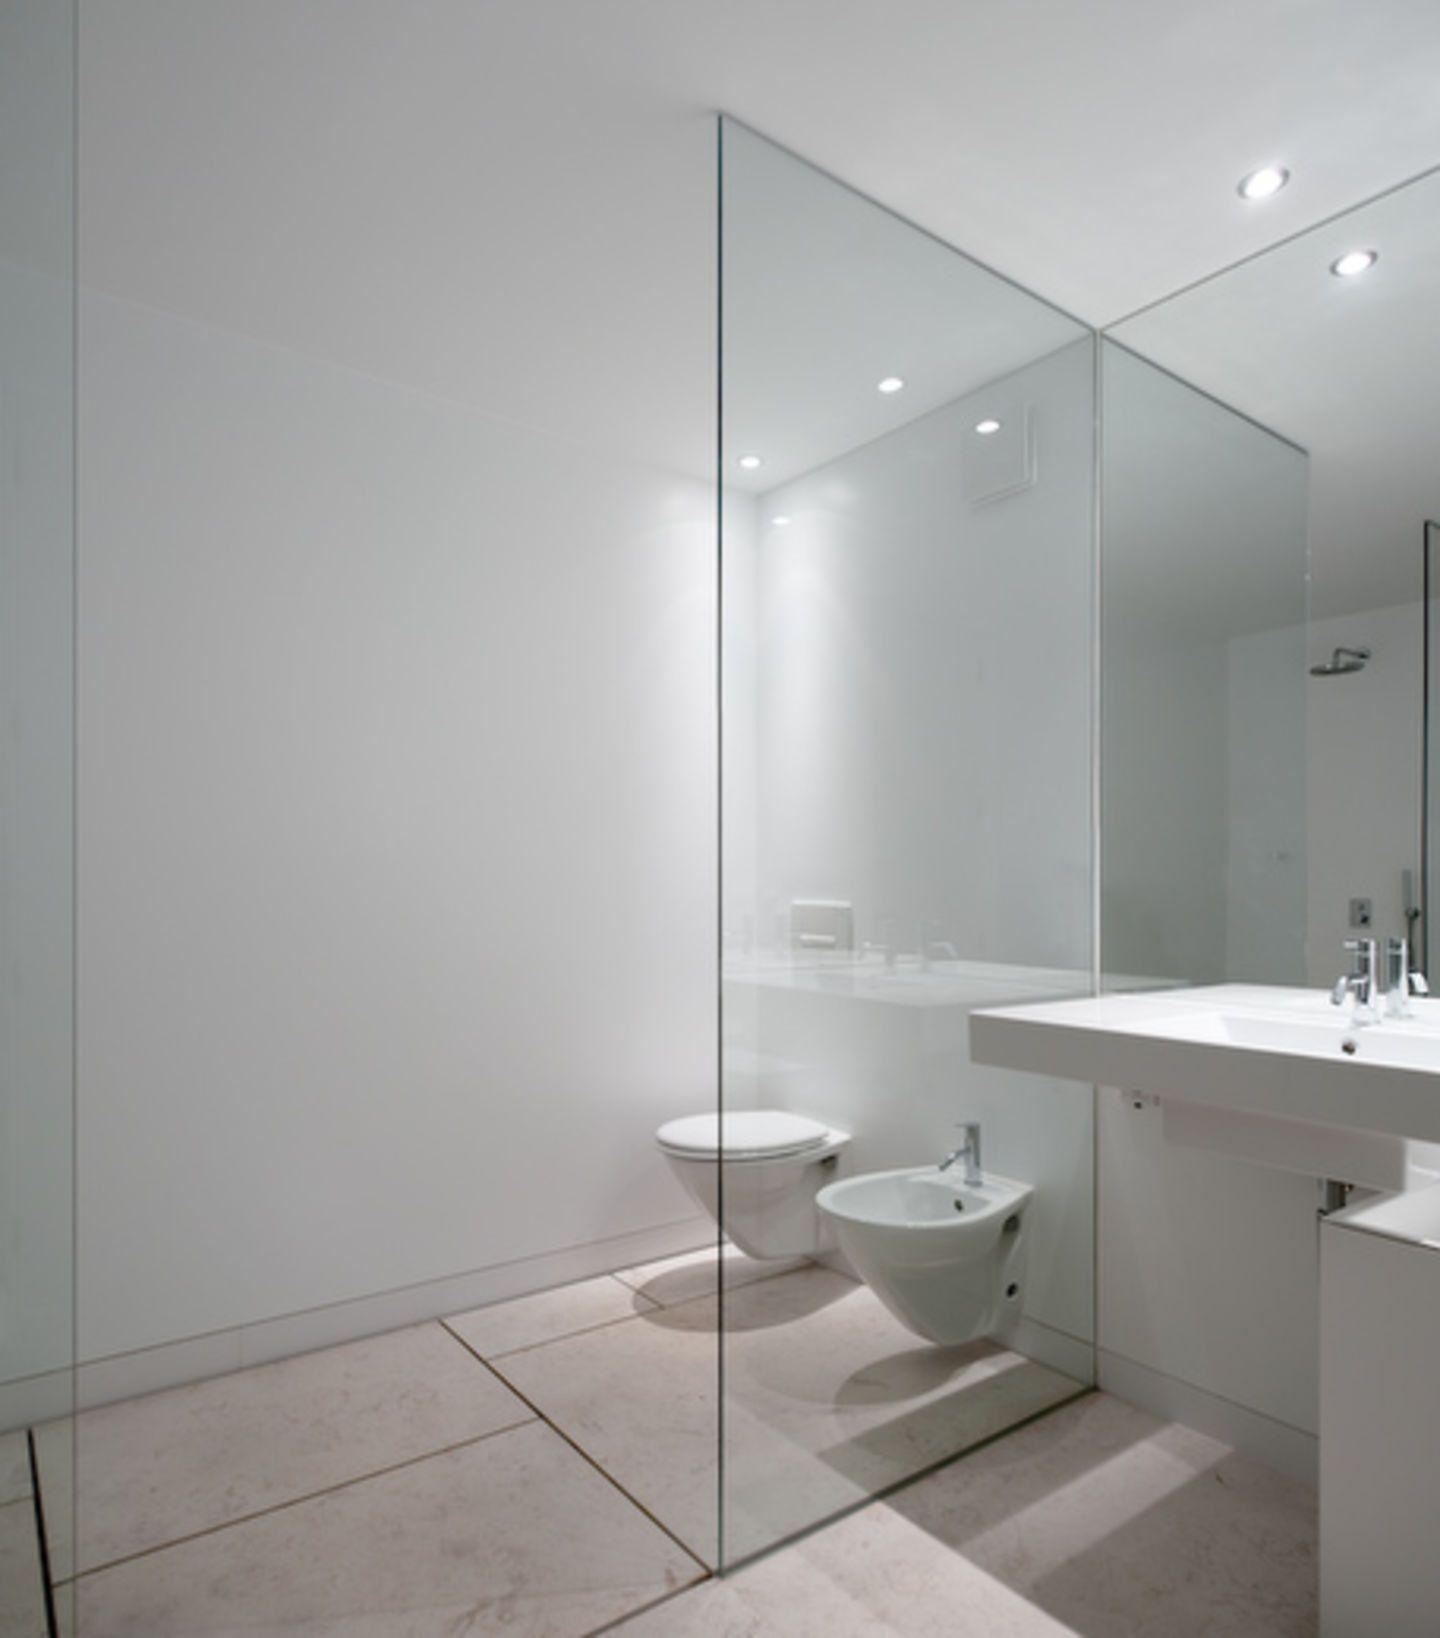 Explore Minimal Bathroom, Minimalist Interior And More